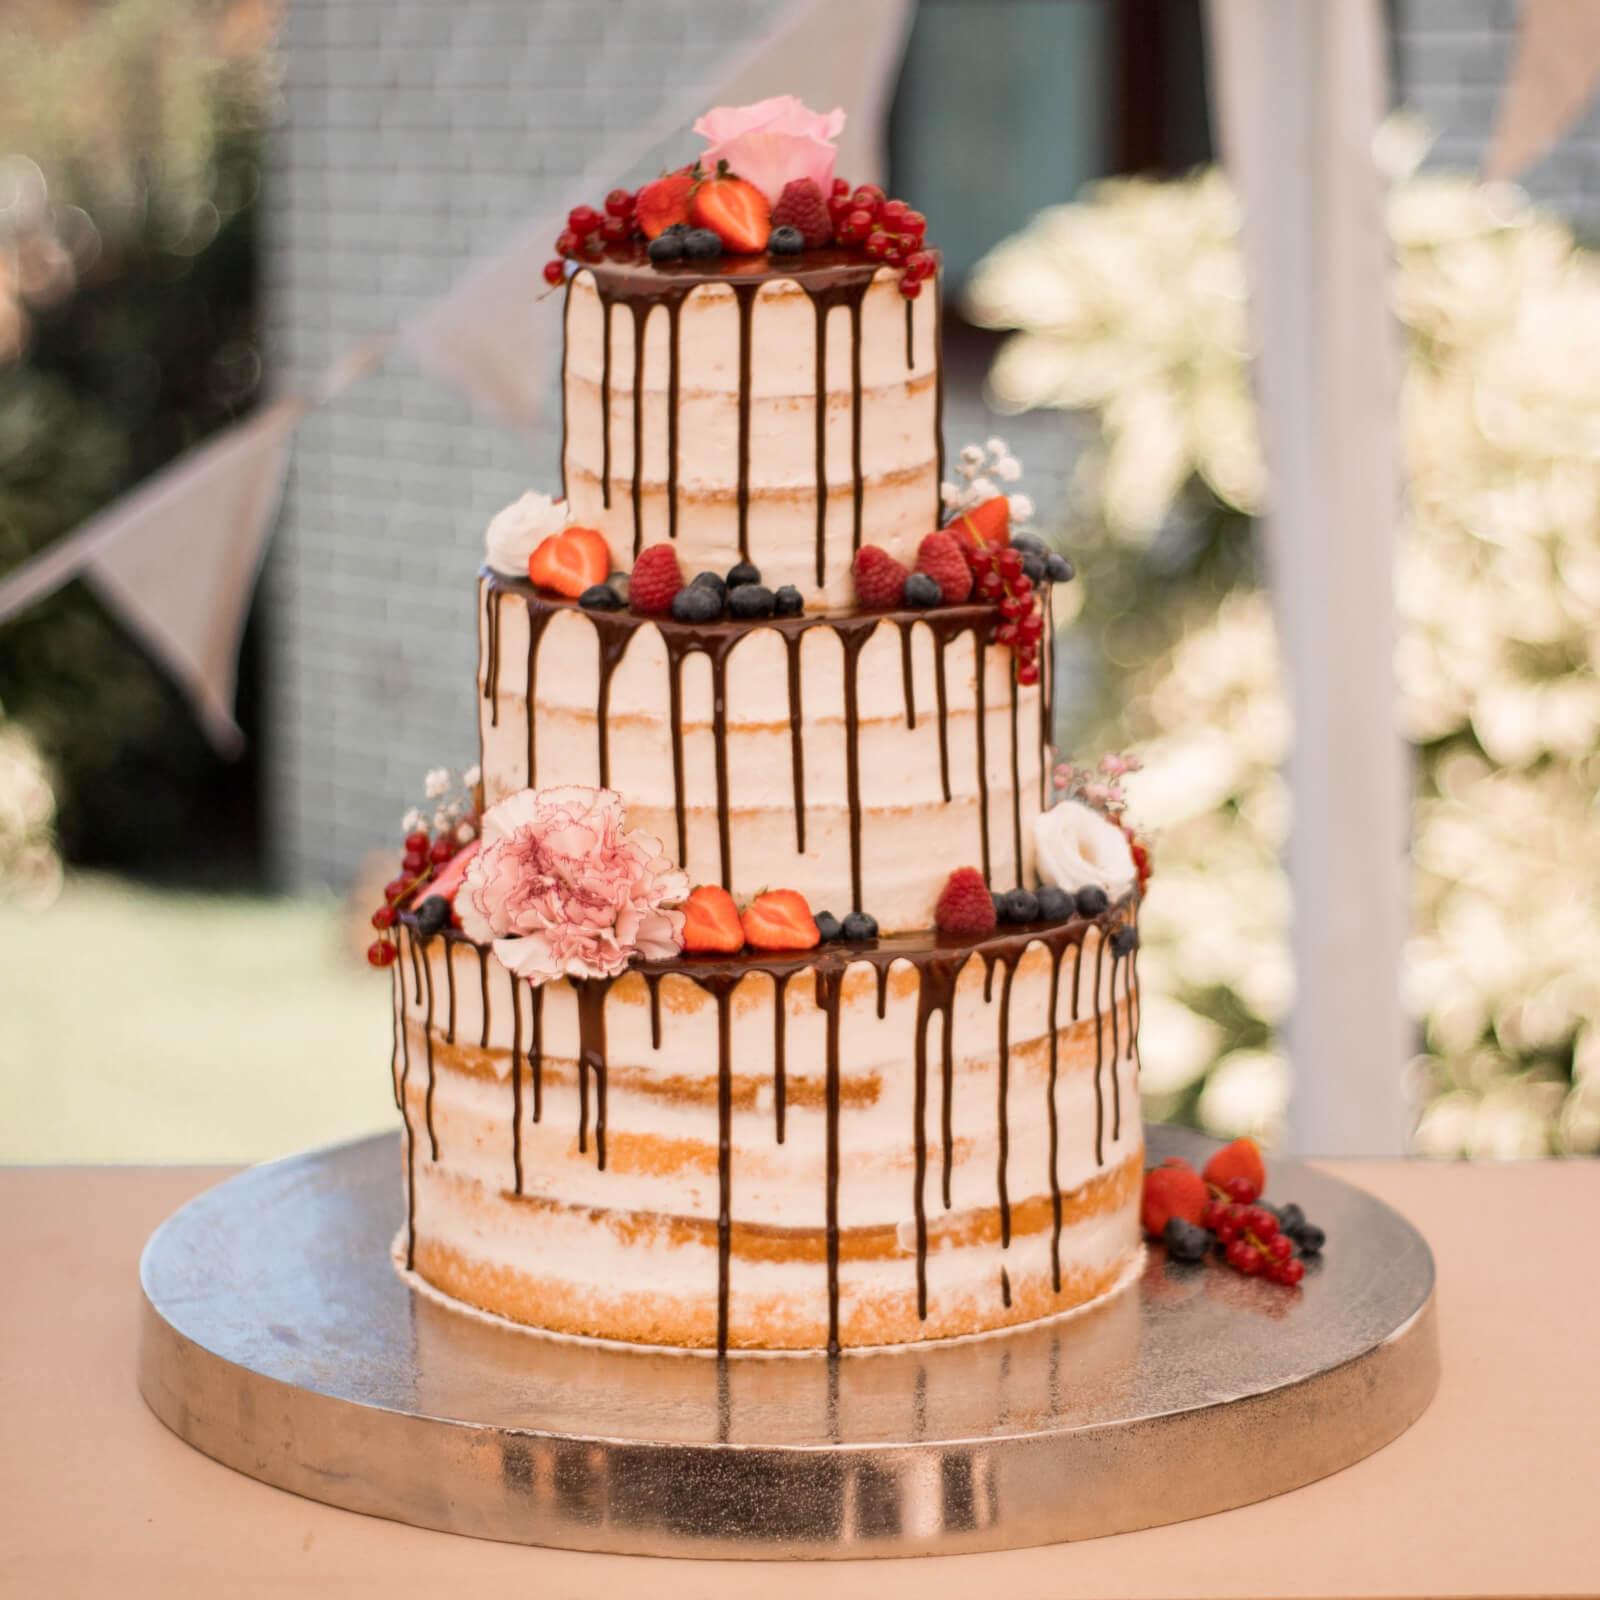 Hochzeitstorte-wedding cake-naked cake-bespoke cake-flowers-berries-blumen-beeren